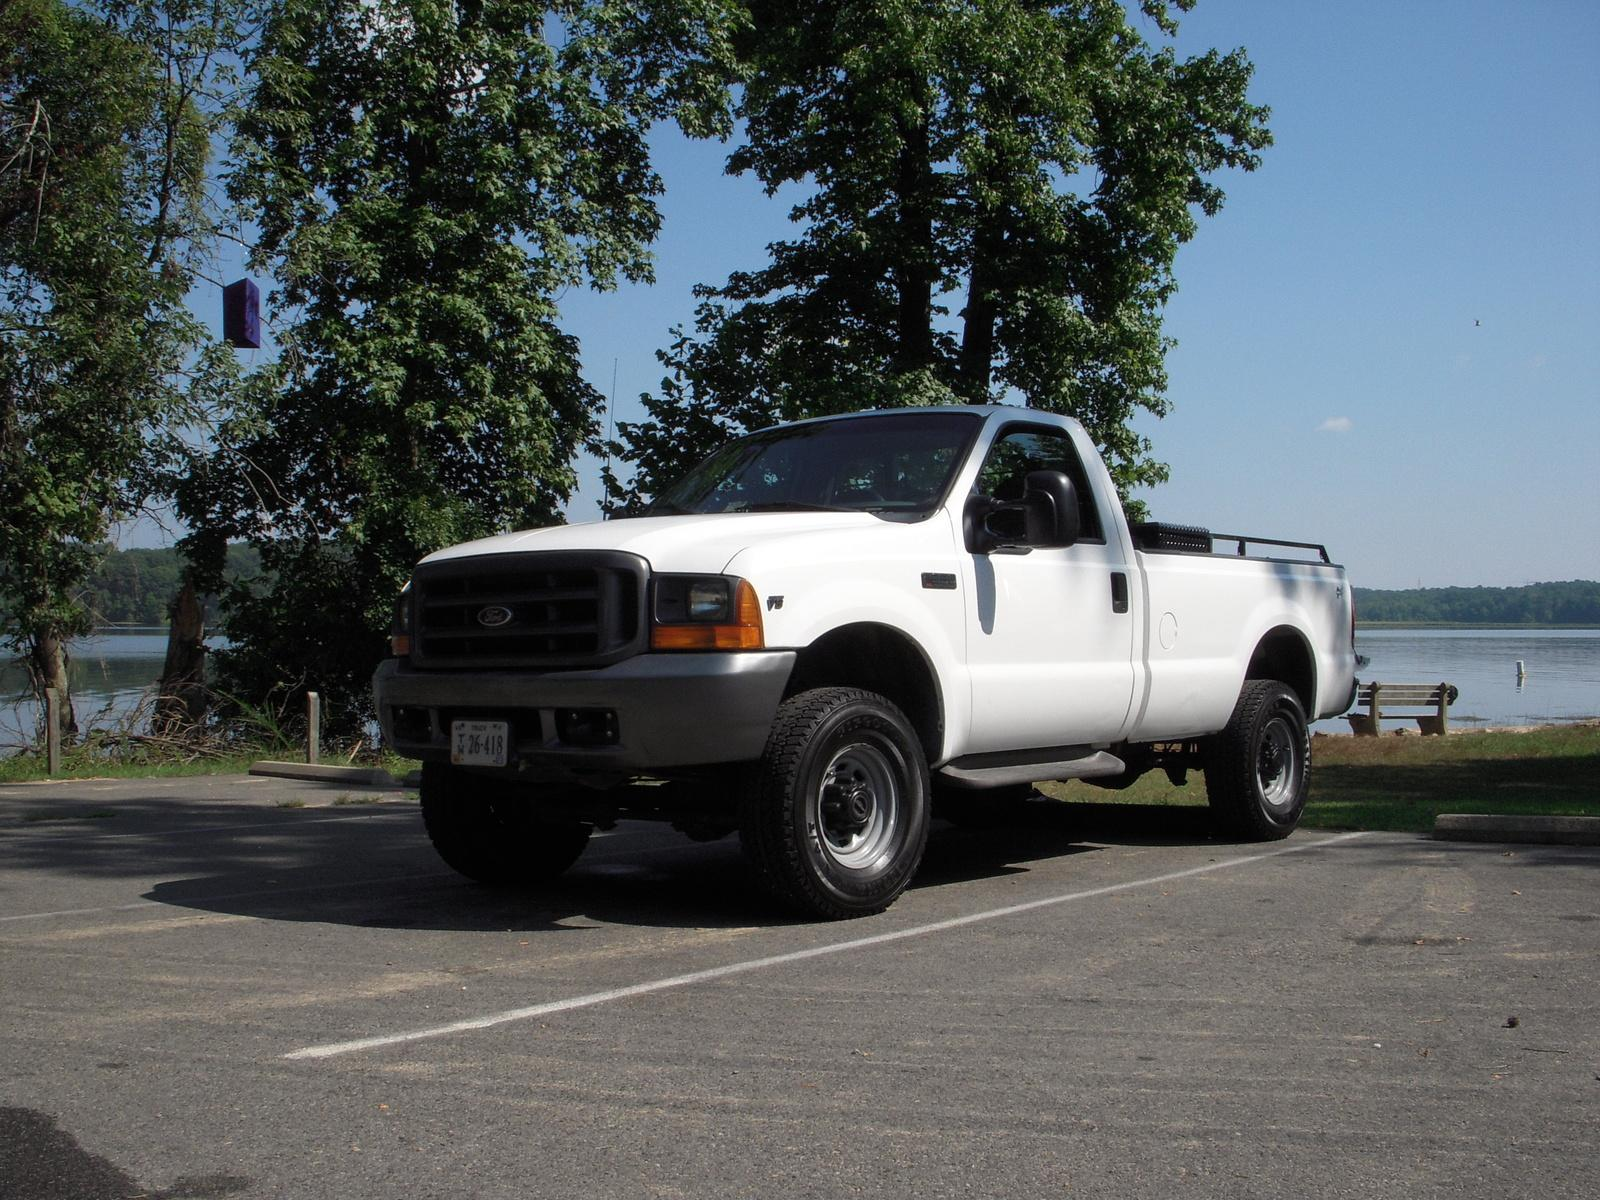 800 1024 1280 1600 origin 2000 ford f 350